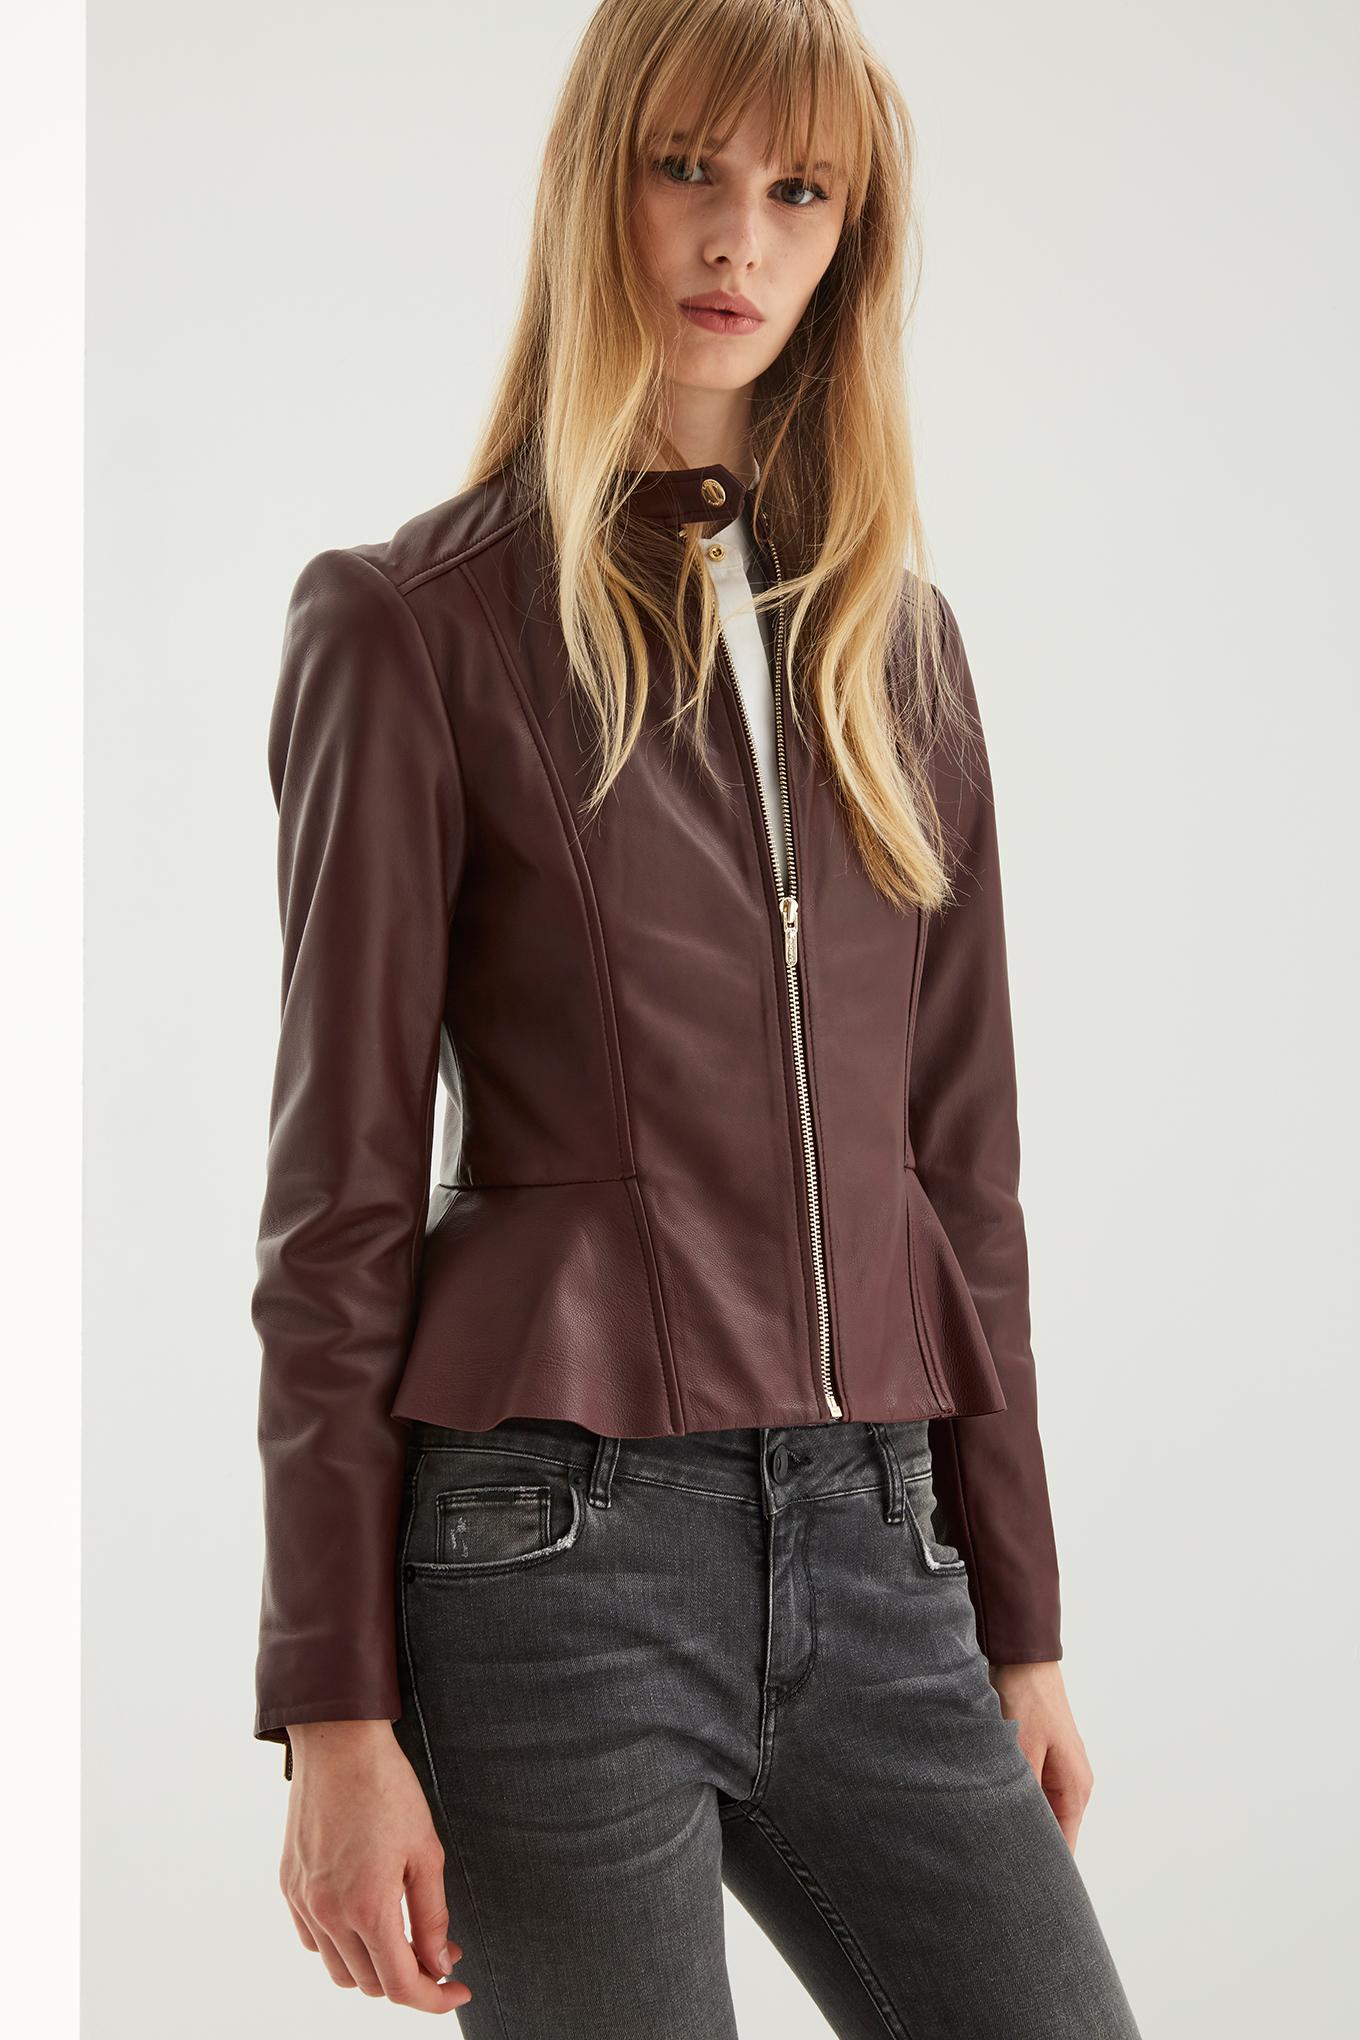 Leather Jacket Bordeaux Casual Woman